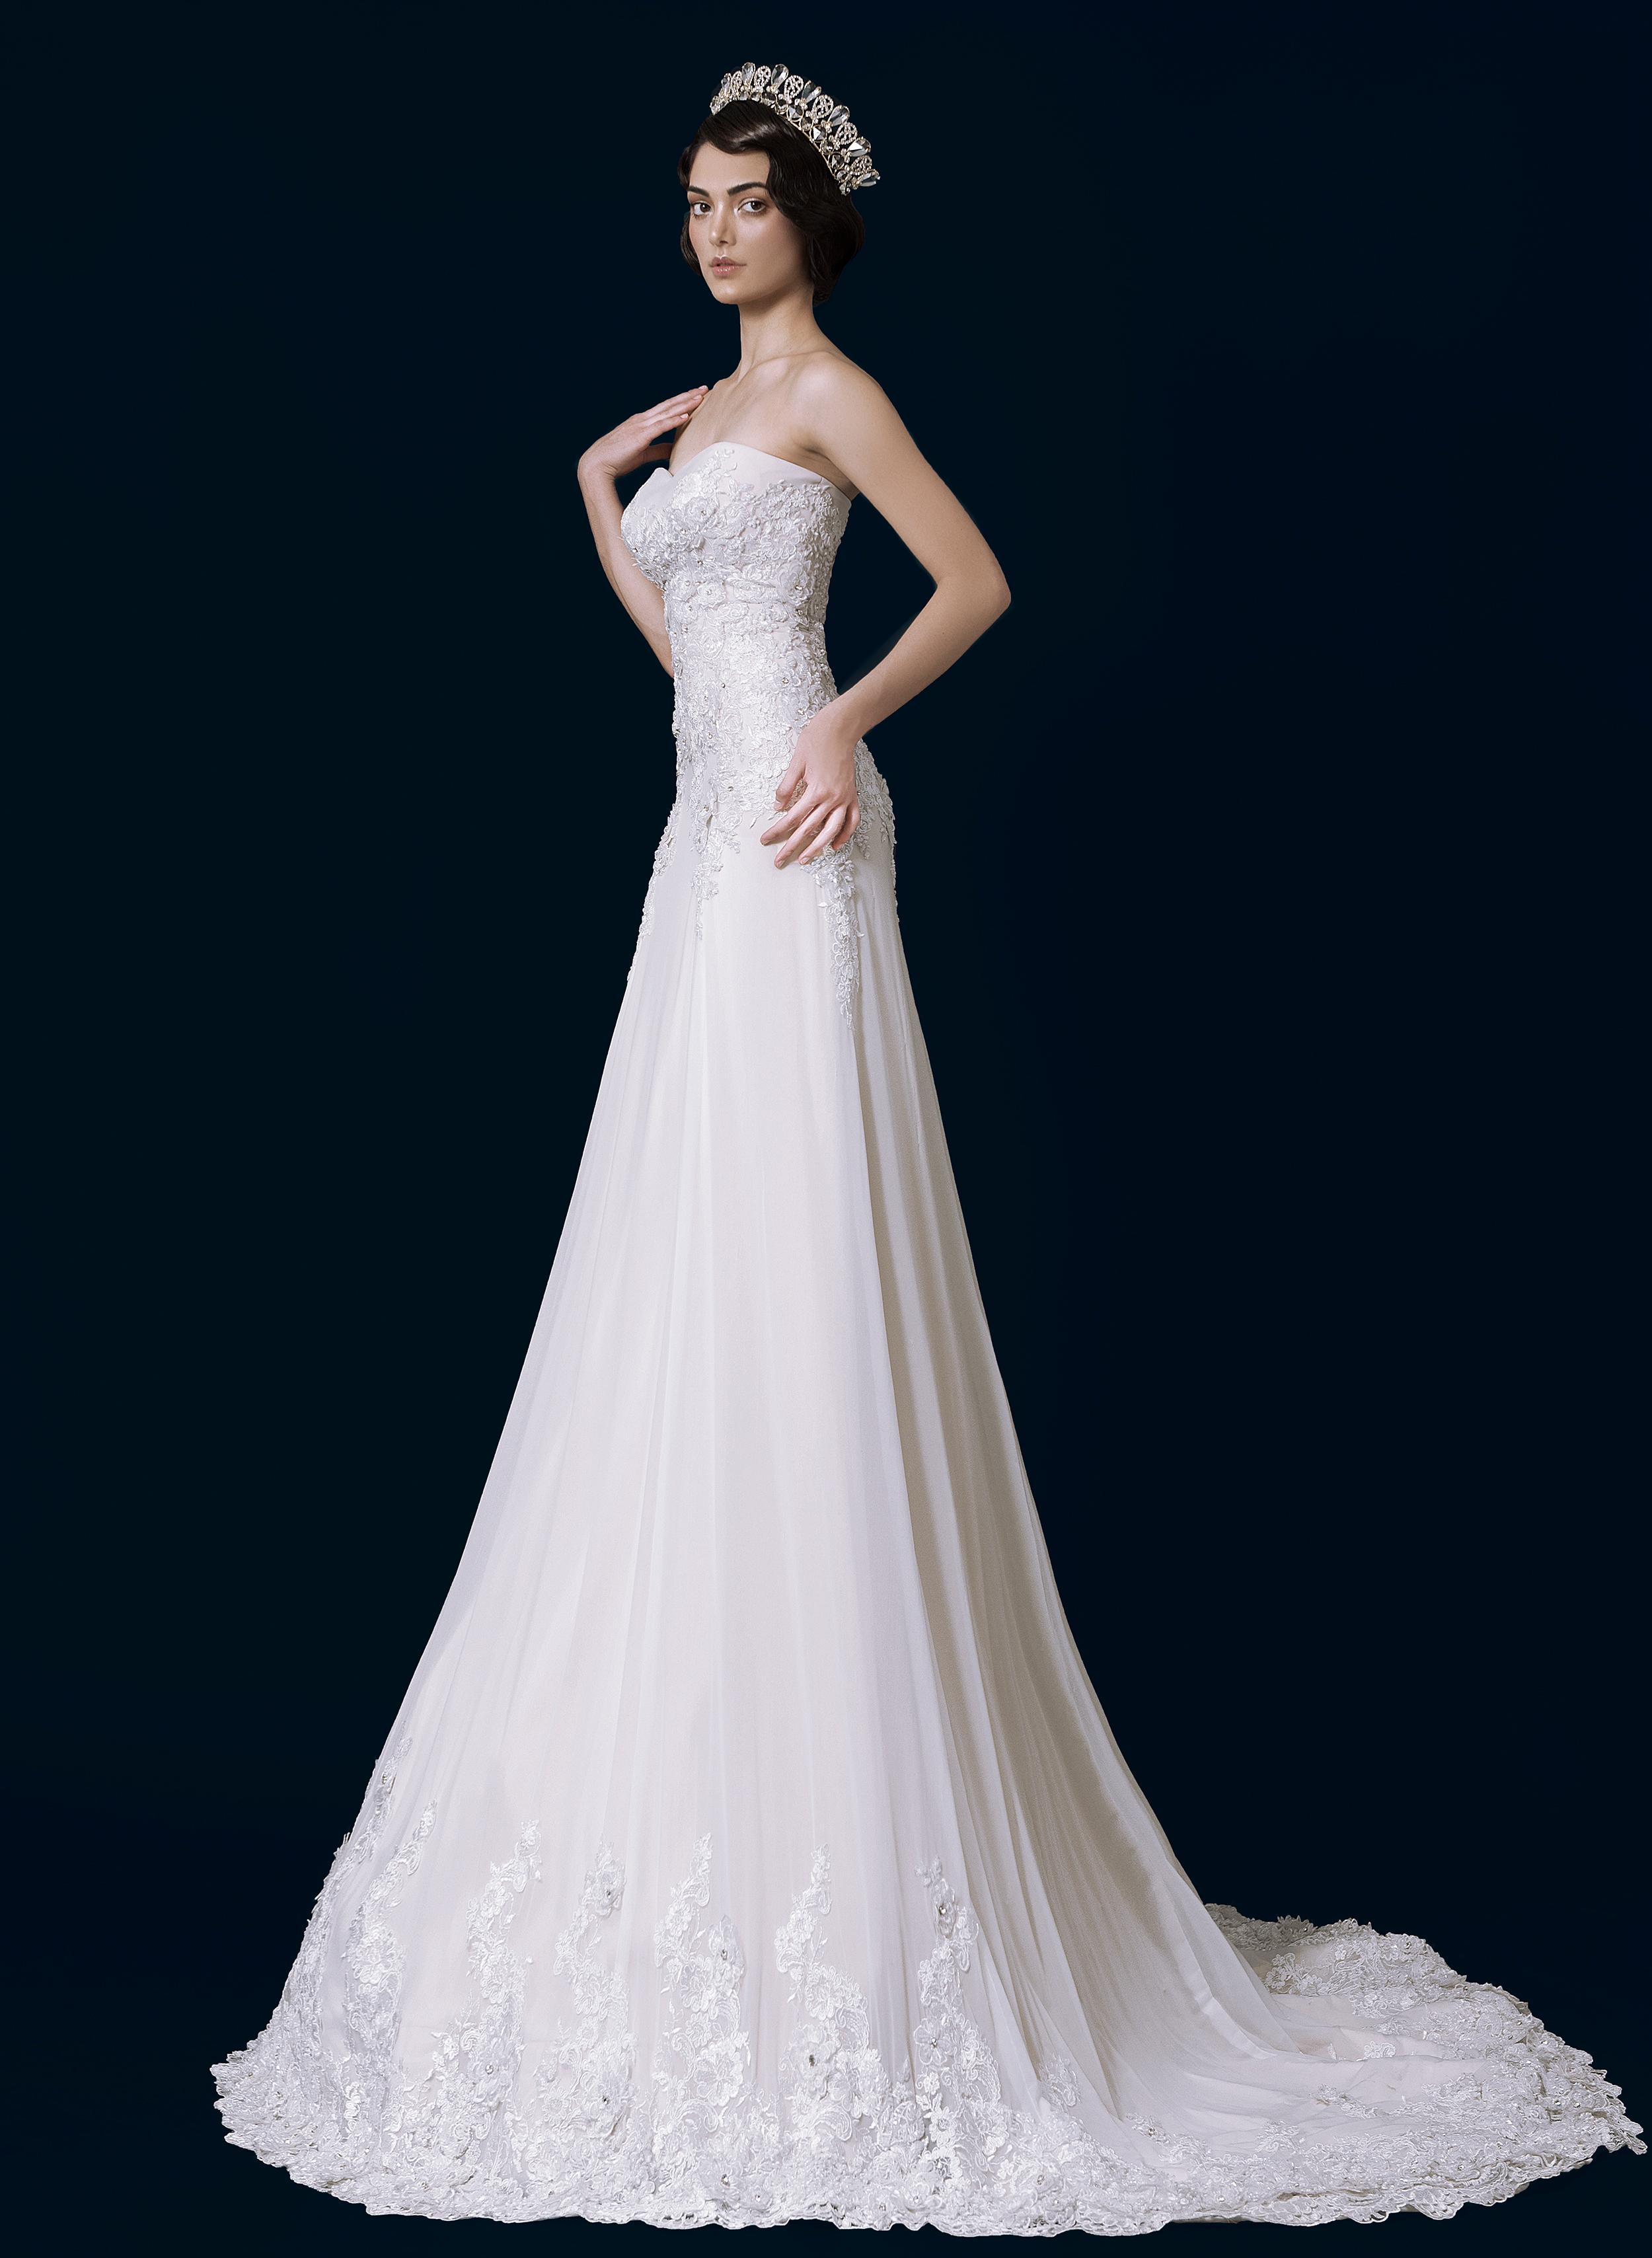 Marisa Wedding Dress - www.zapatosades.top